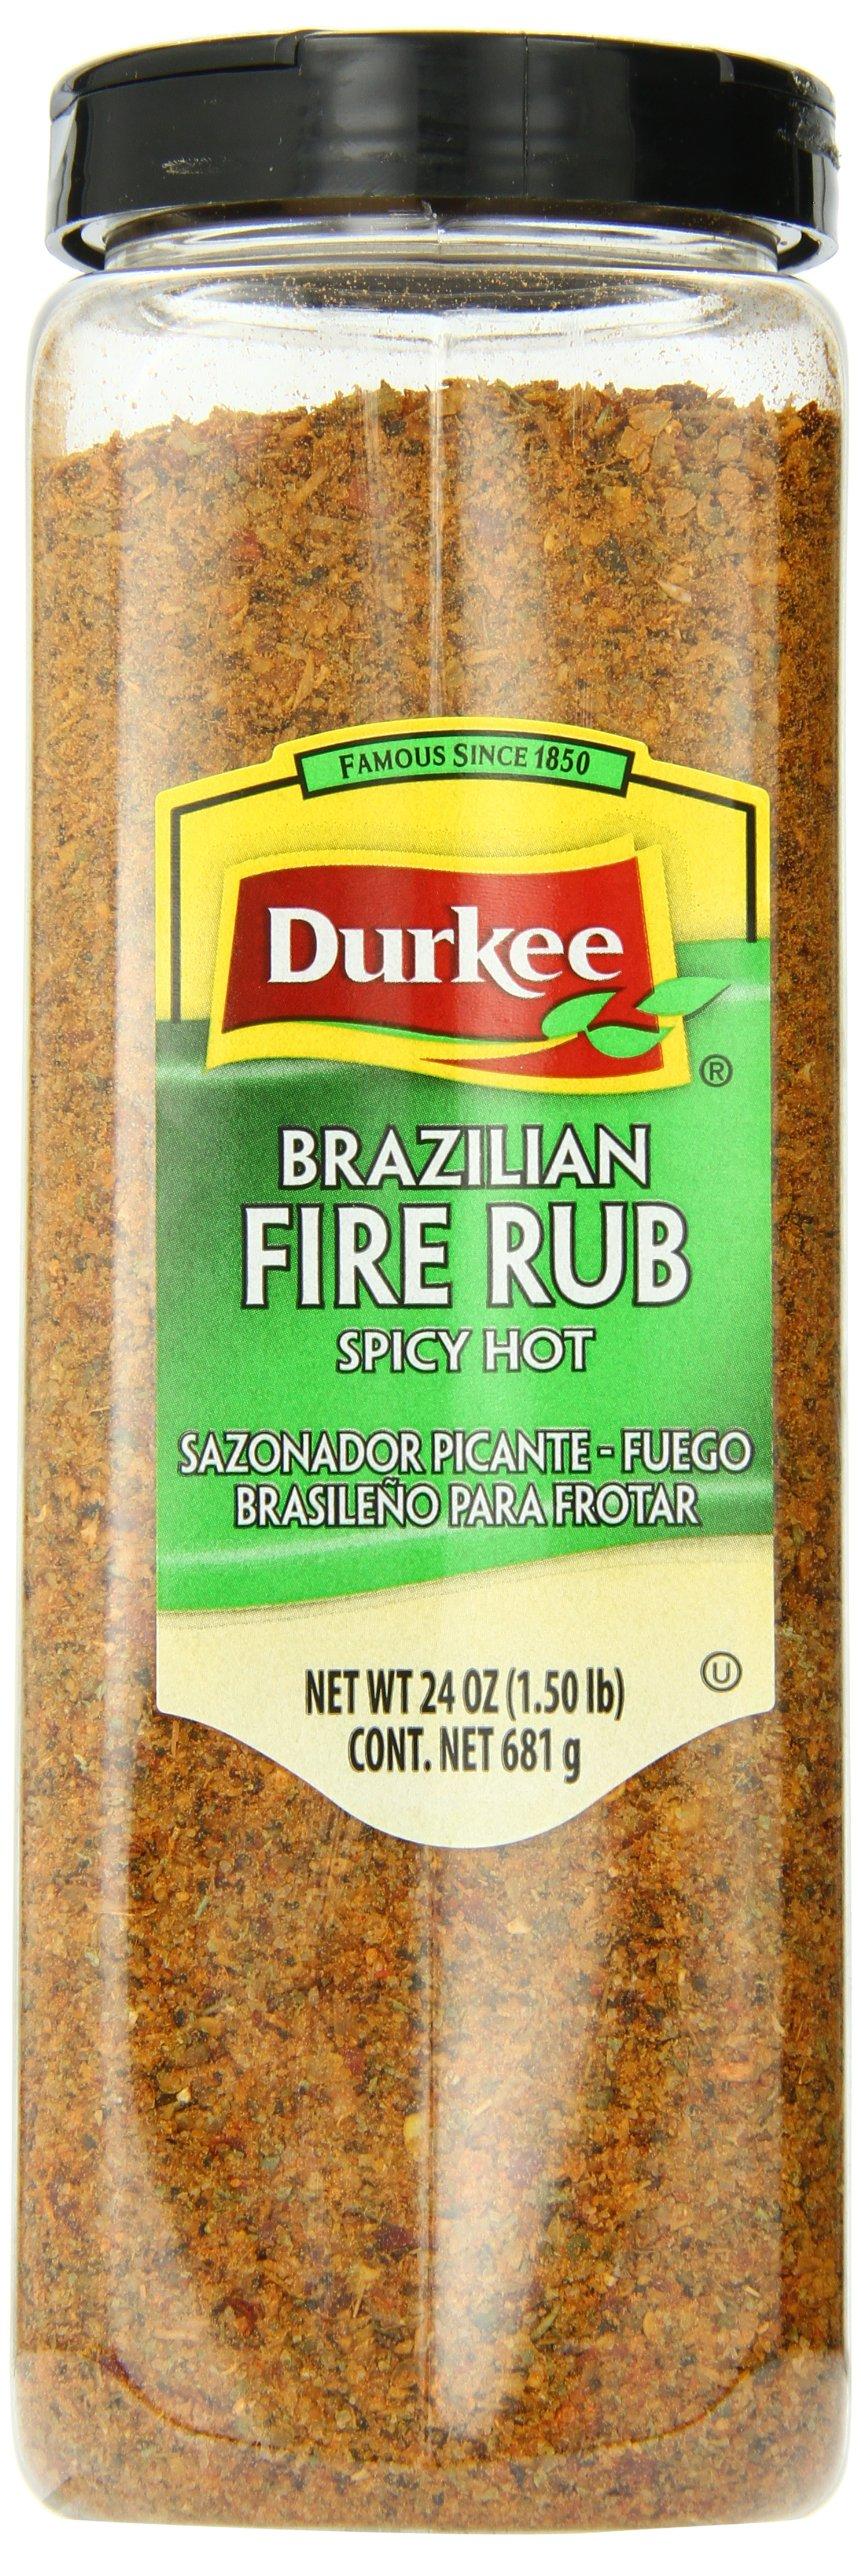 Durkee Brazilian Fire Rub, 24-Ounce